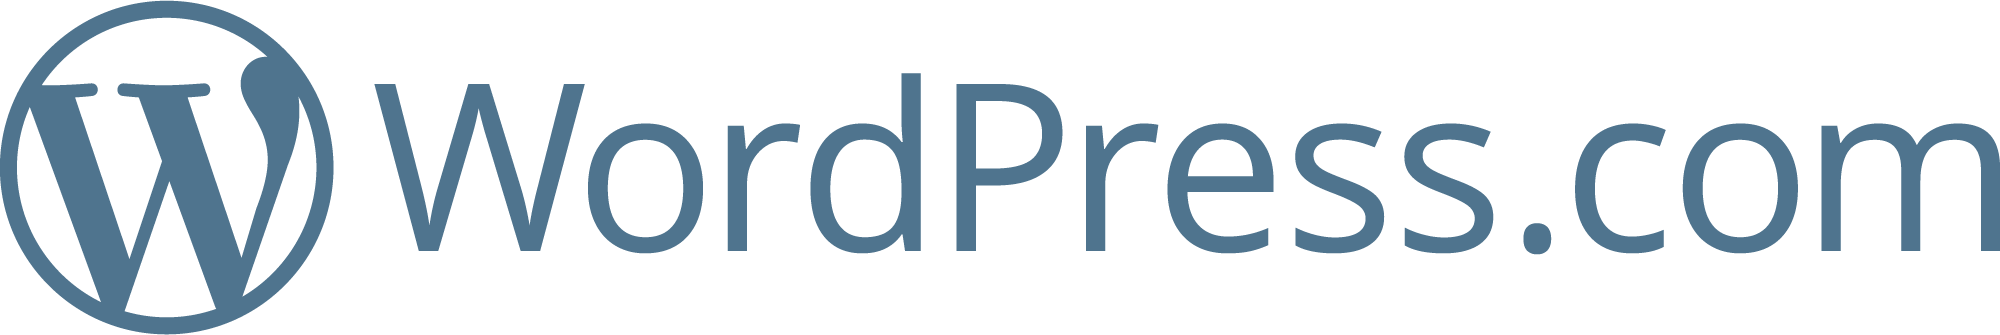 Logotipo do WordPress.com